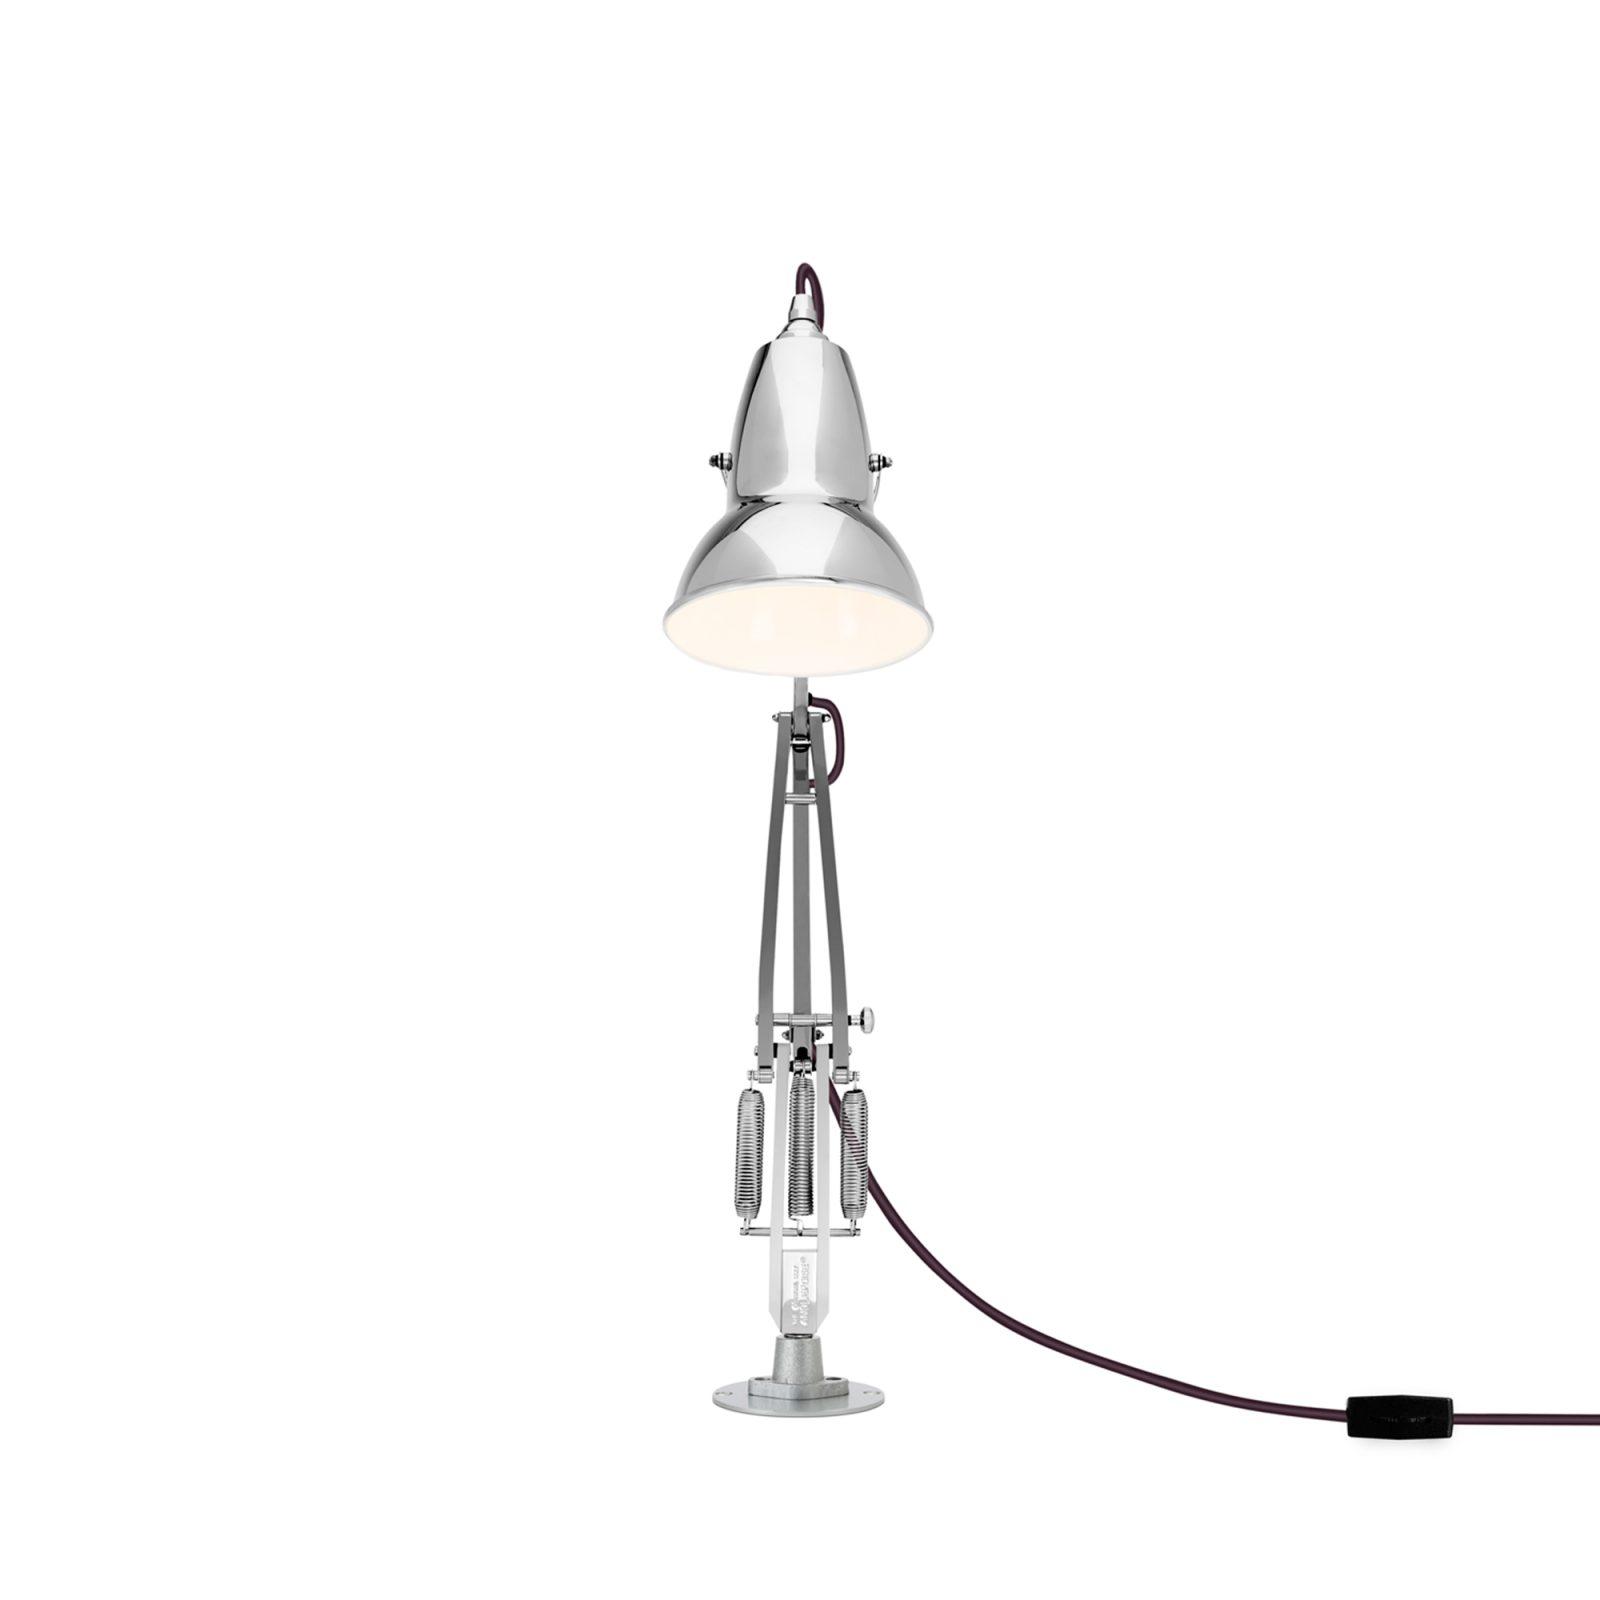 original-1227-desk-lamp-with-desk-insert